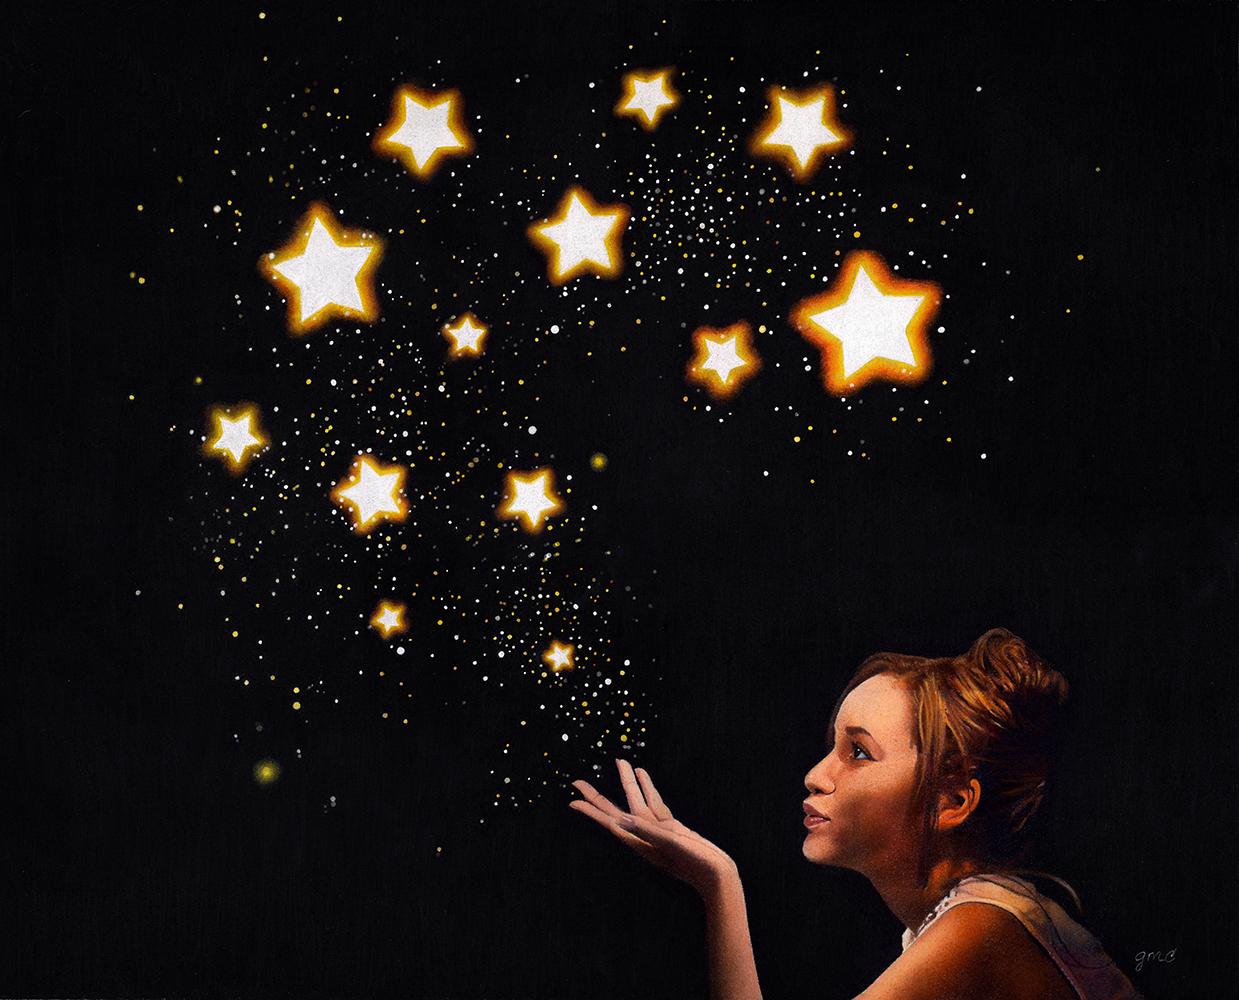 gina_candelario_ima_sky_full_of_stars